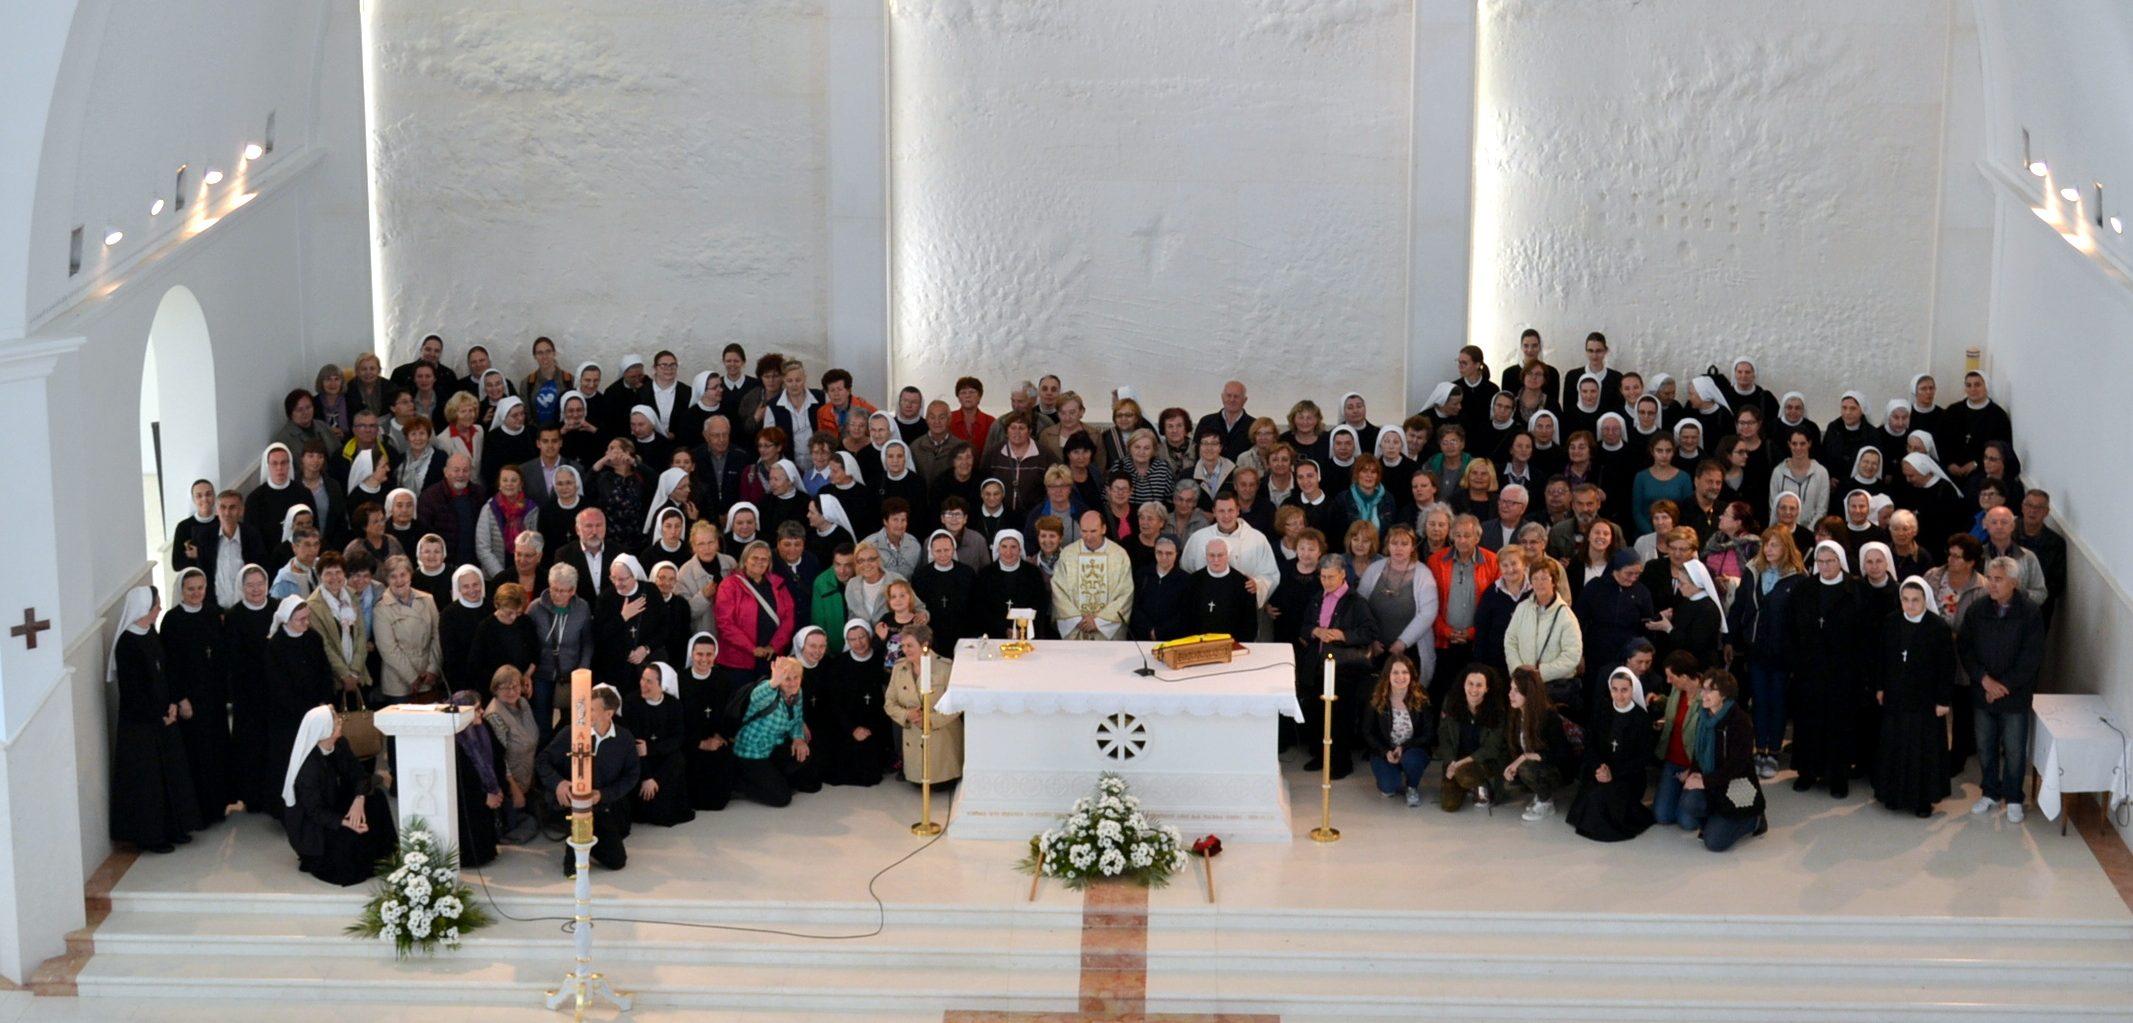 Vincentian Family in Croatia: 400th Anniversary National Pilgrimage